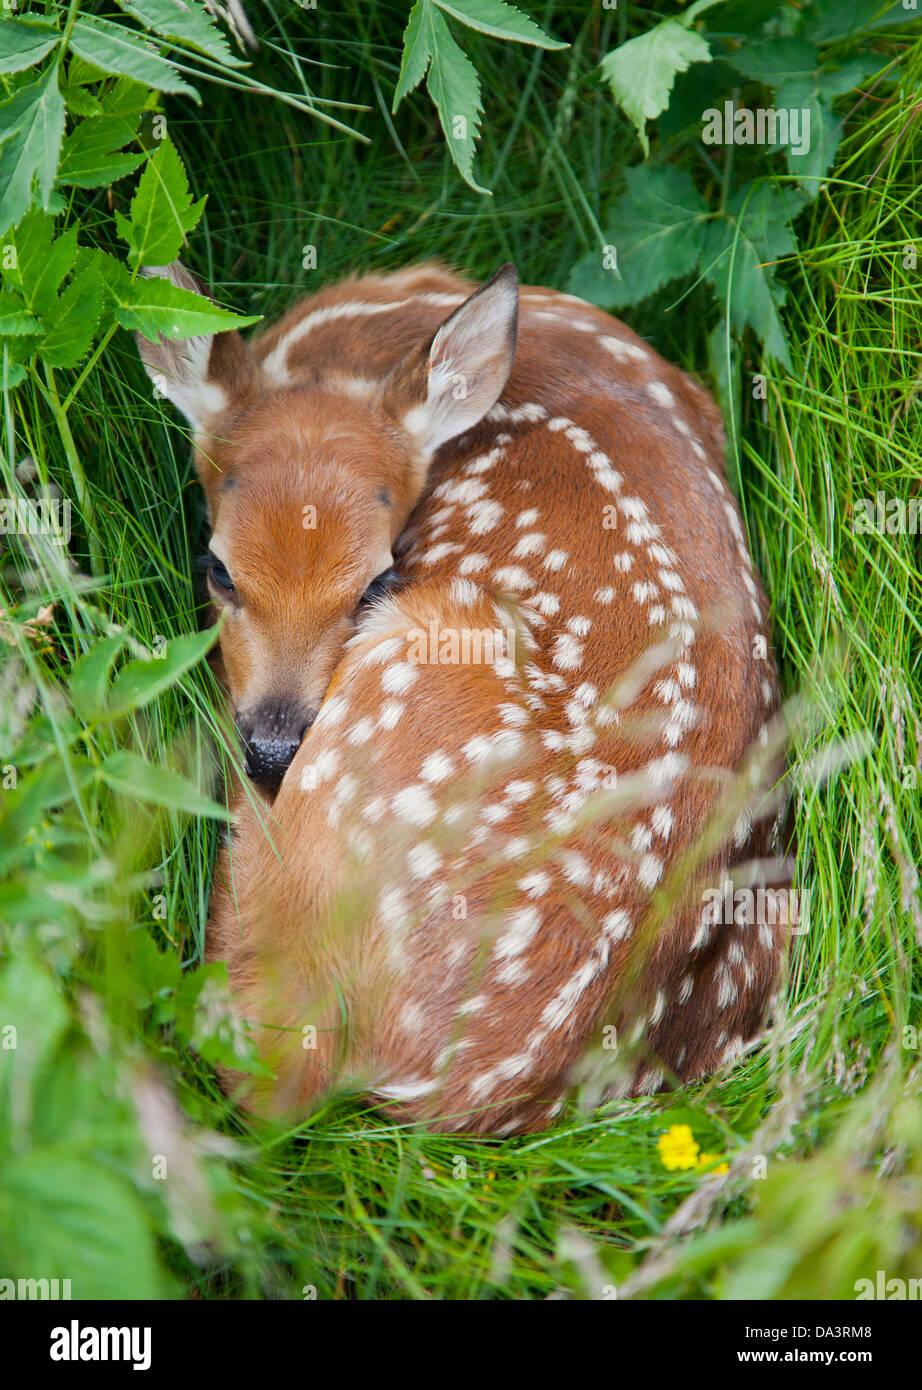 Le cerf de Virginie (Odocoileus virginianus) fauve se cacher dans l'herbe haute Photo Stock